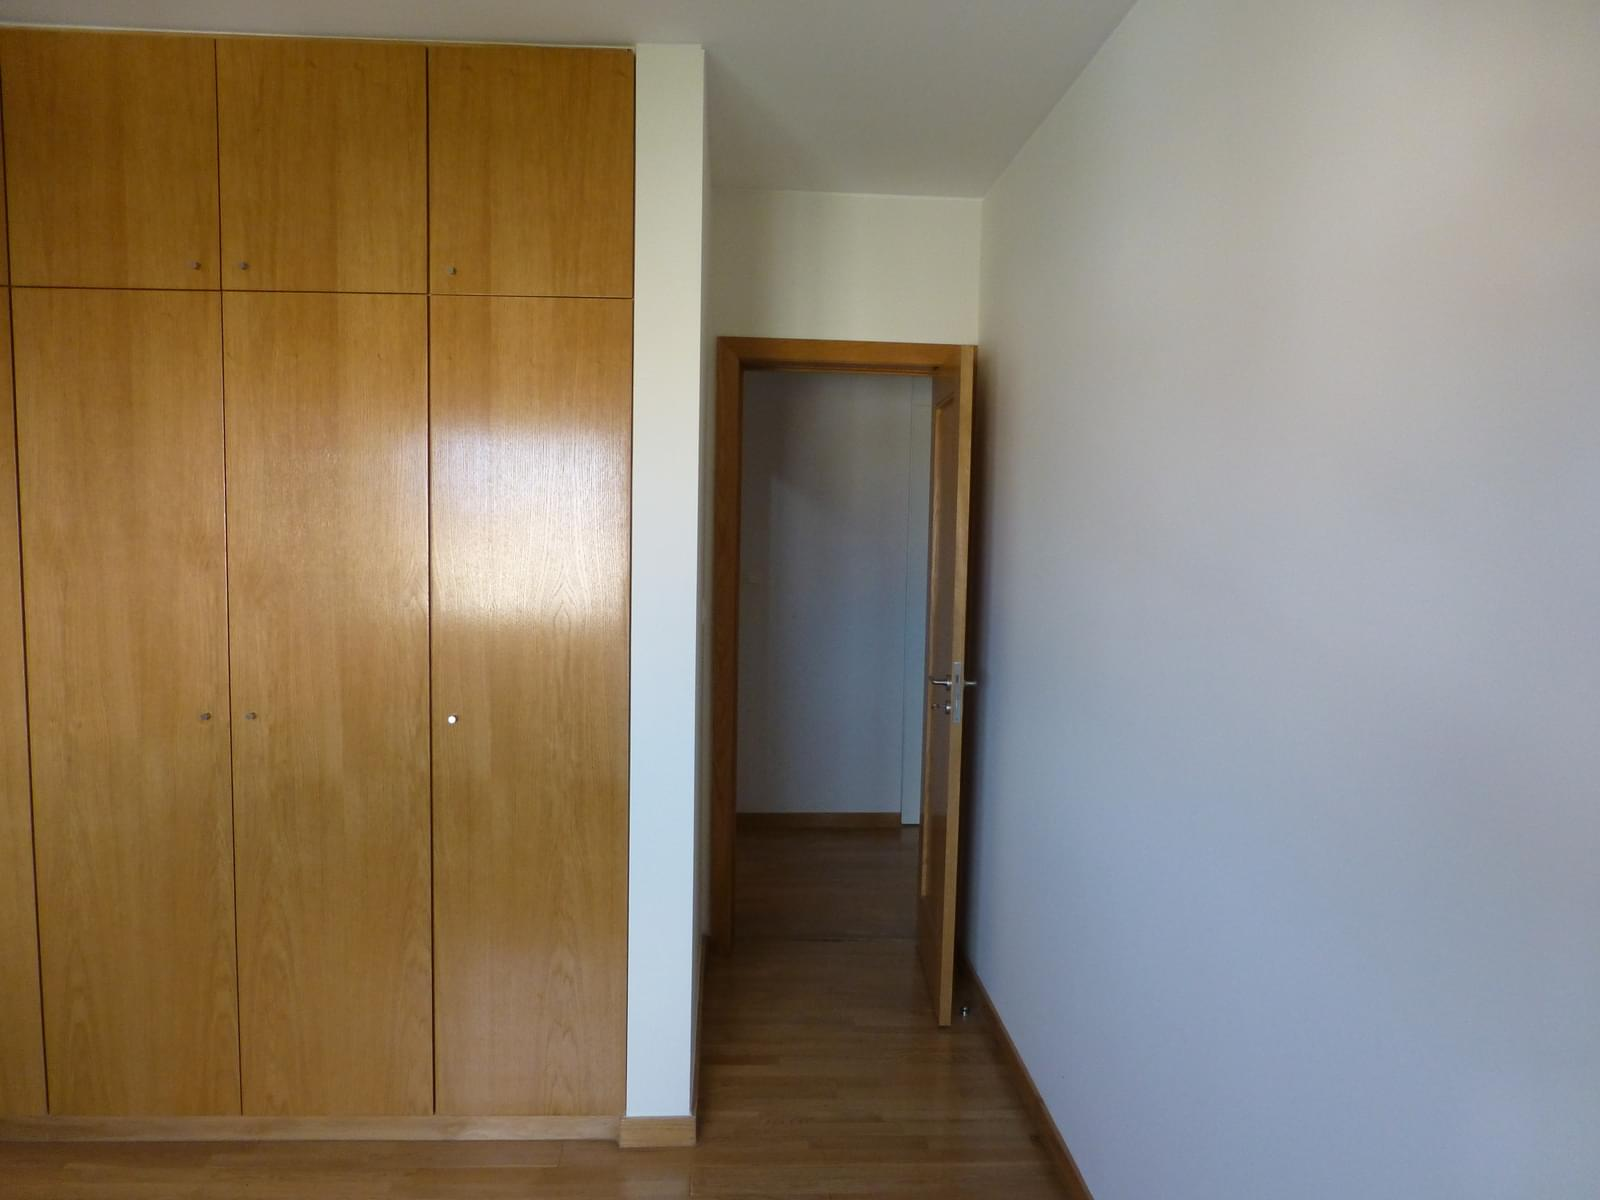 pf17050-apartamento-t1-lisboa-c13df7bc-4d2f-478d-8d88-e5fabd58a14f